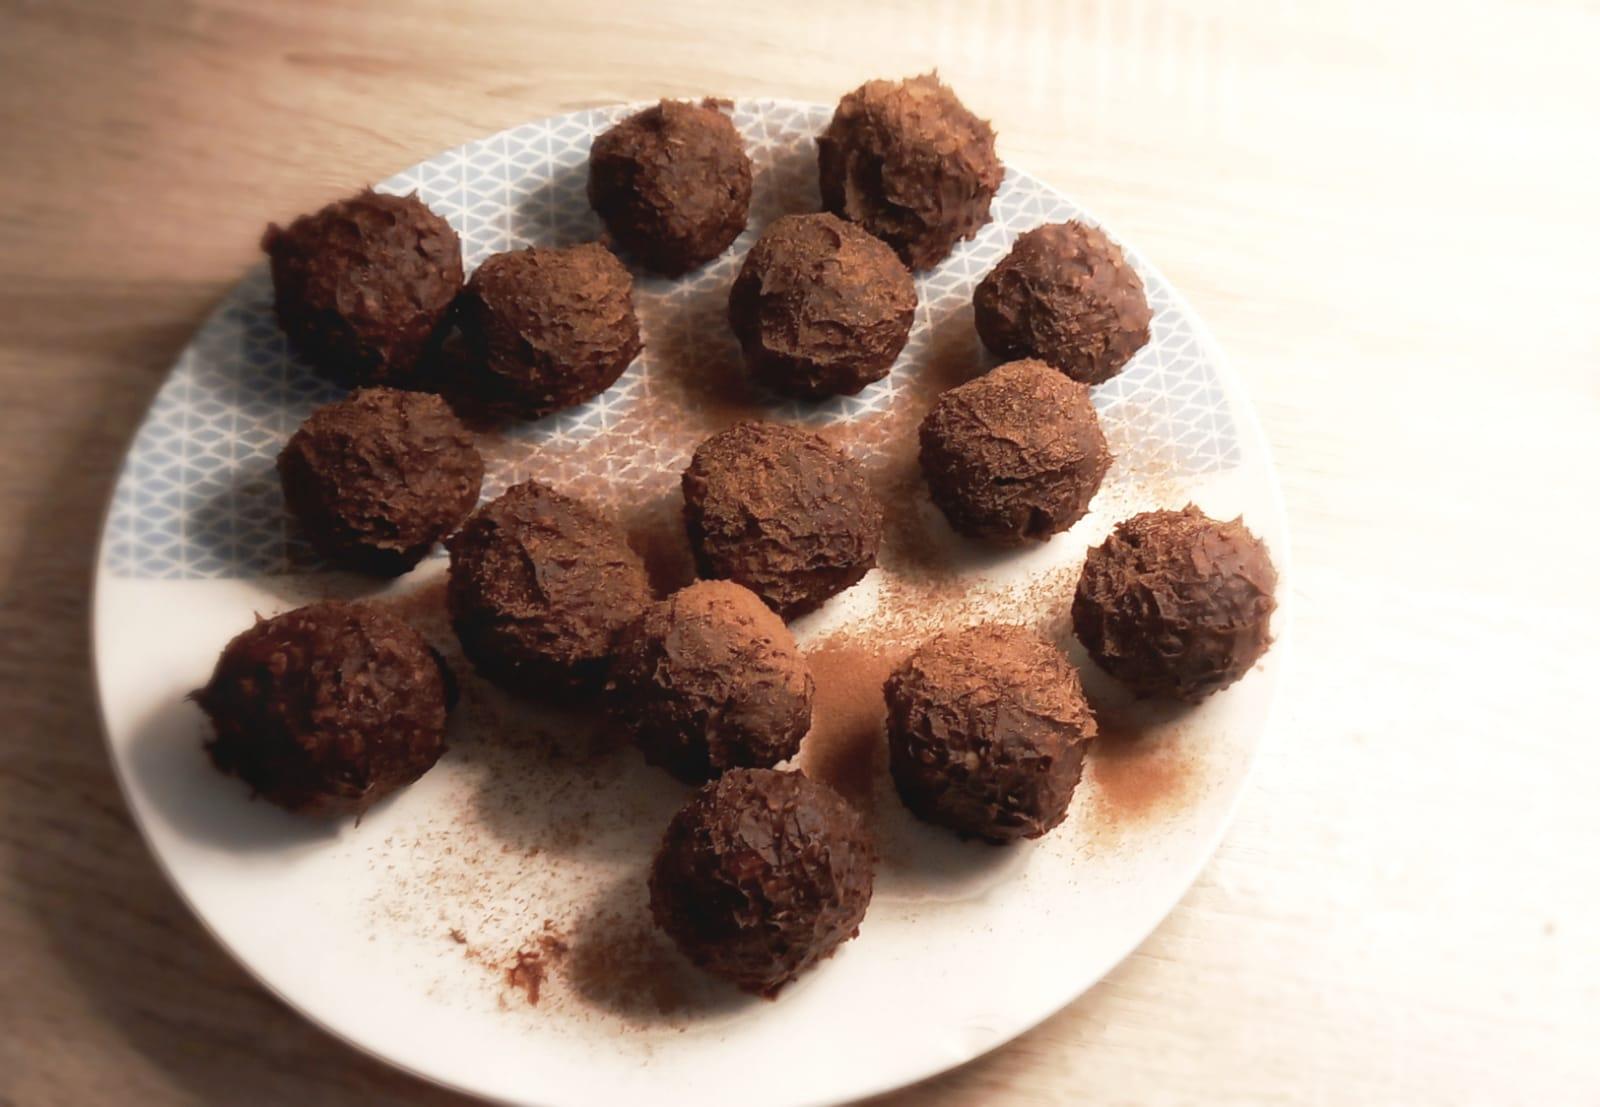 GO CAMP RECIPE: Gluten-free Chocolate Camping Snacks